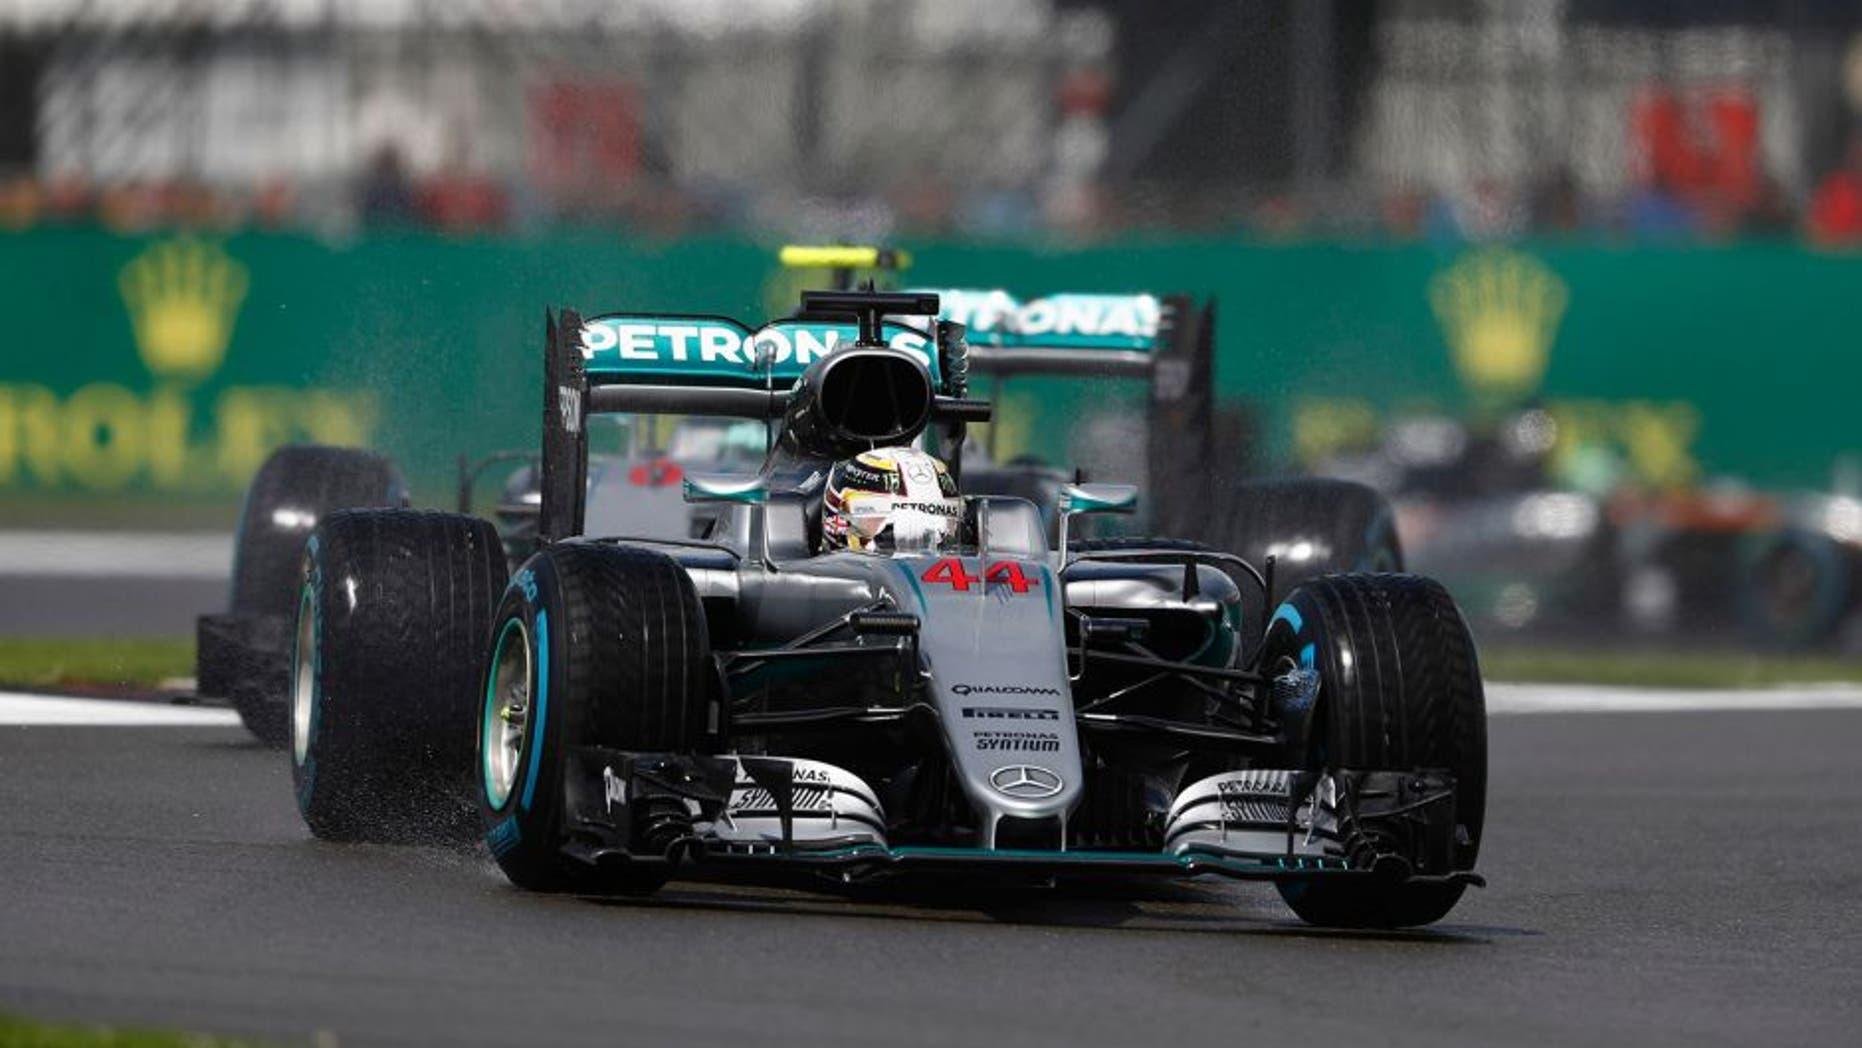 Silverstone, Northamptonshire, UK Sunday 10 July 2016. Lewis Hamilton, Mercedes F1 W07 Hybrid, leads Nico Rosberg, Mercedes F1 W07 Hybrid. World Copyright: Glenn Dunbar/LAT Photographic ref: Digital Image _V2I0159